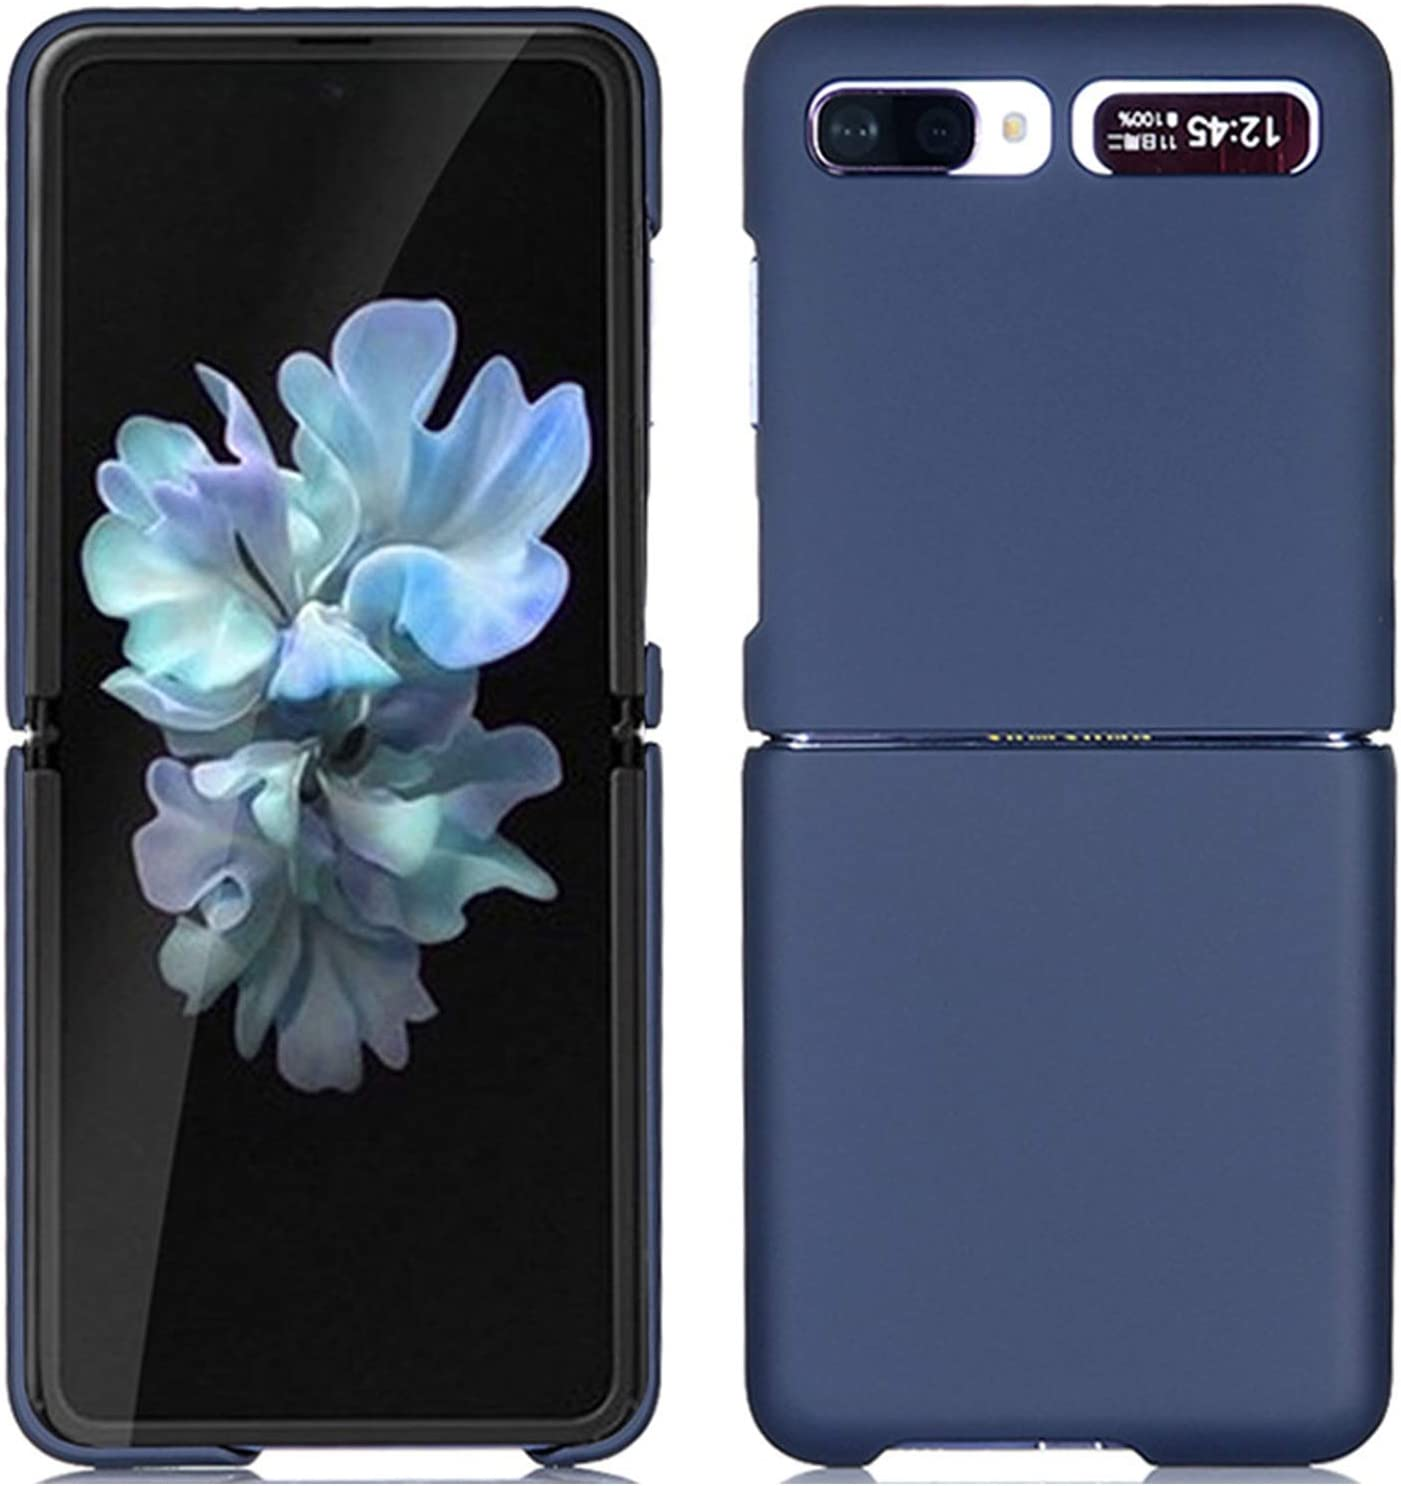 Miimall Compatible Samsung Galaxy Z Flip Case PC Hard Precise Ultra Thin Slim Bumper Anti-Scratch Shock-Proof Protector Case Cover Accessories for Galaxy Z Flip(Dark Blue)